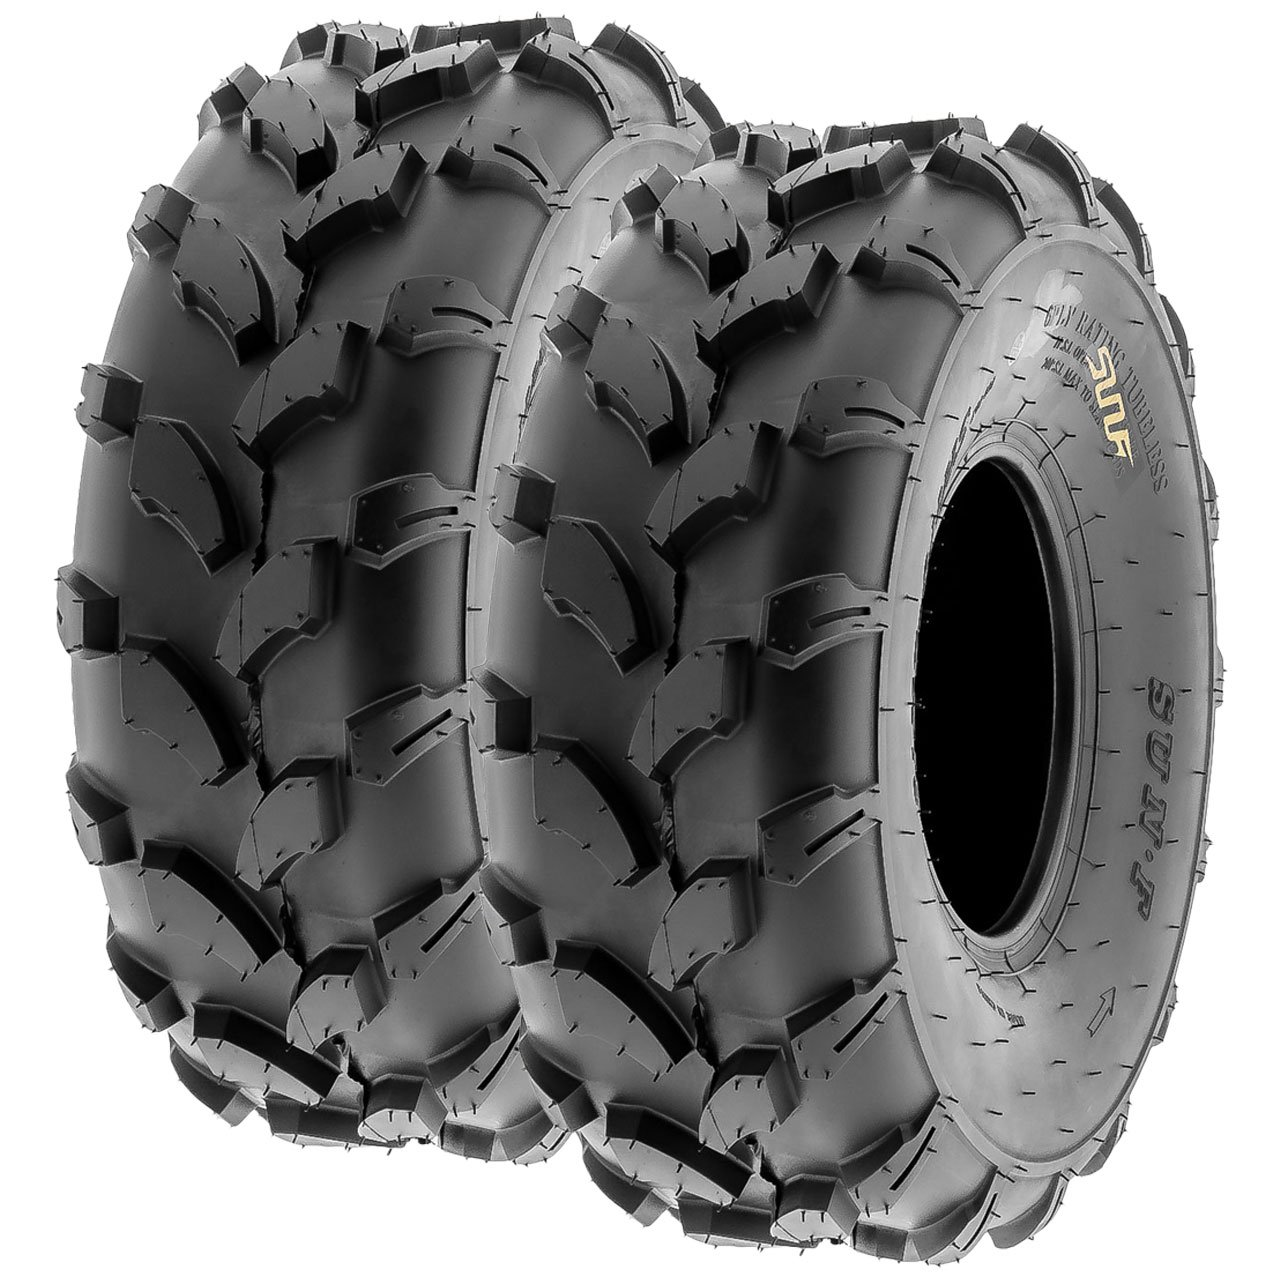 SunF A003 ATV/UTV/Lawn-Mowers Off-Road Tire 18x7-8, 6 PR, Directional Tread (Pair of 2)